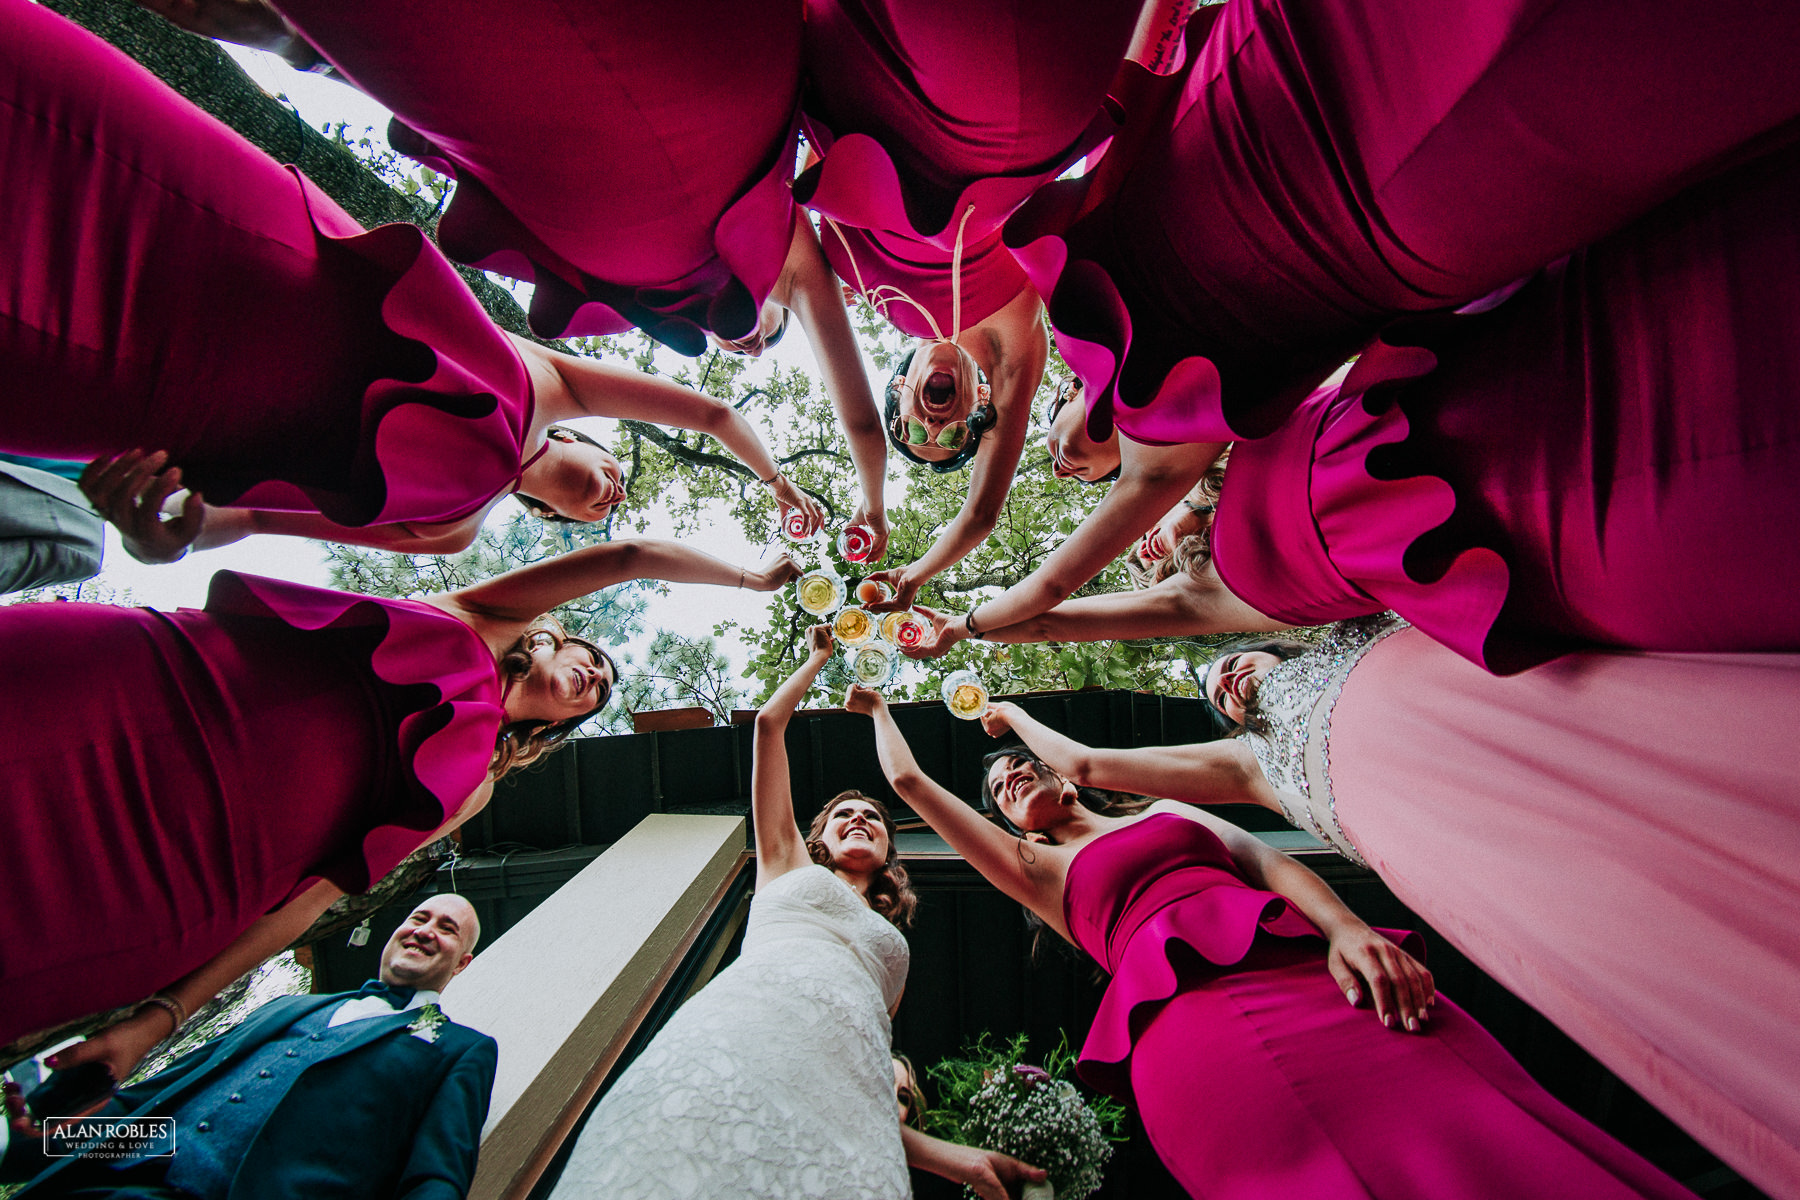 Fotografo de bodas guadalajara Alan Robles - Pinare terraza bistro 28